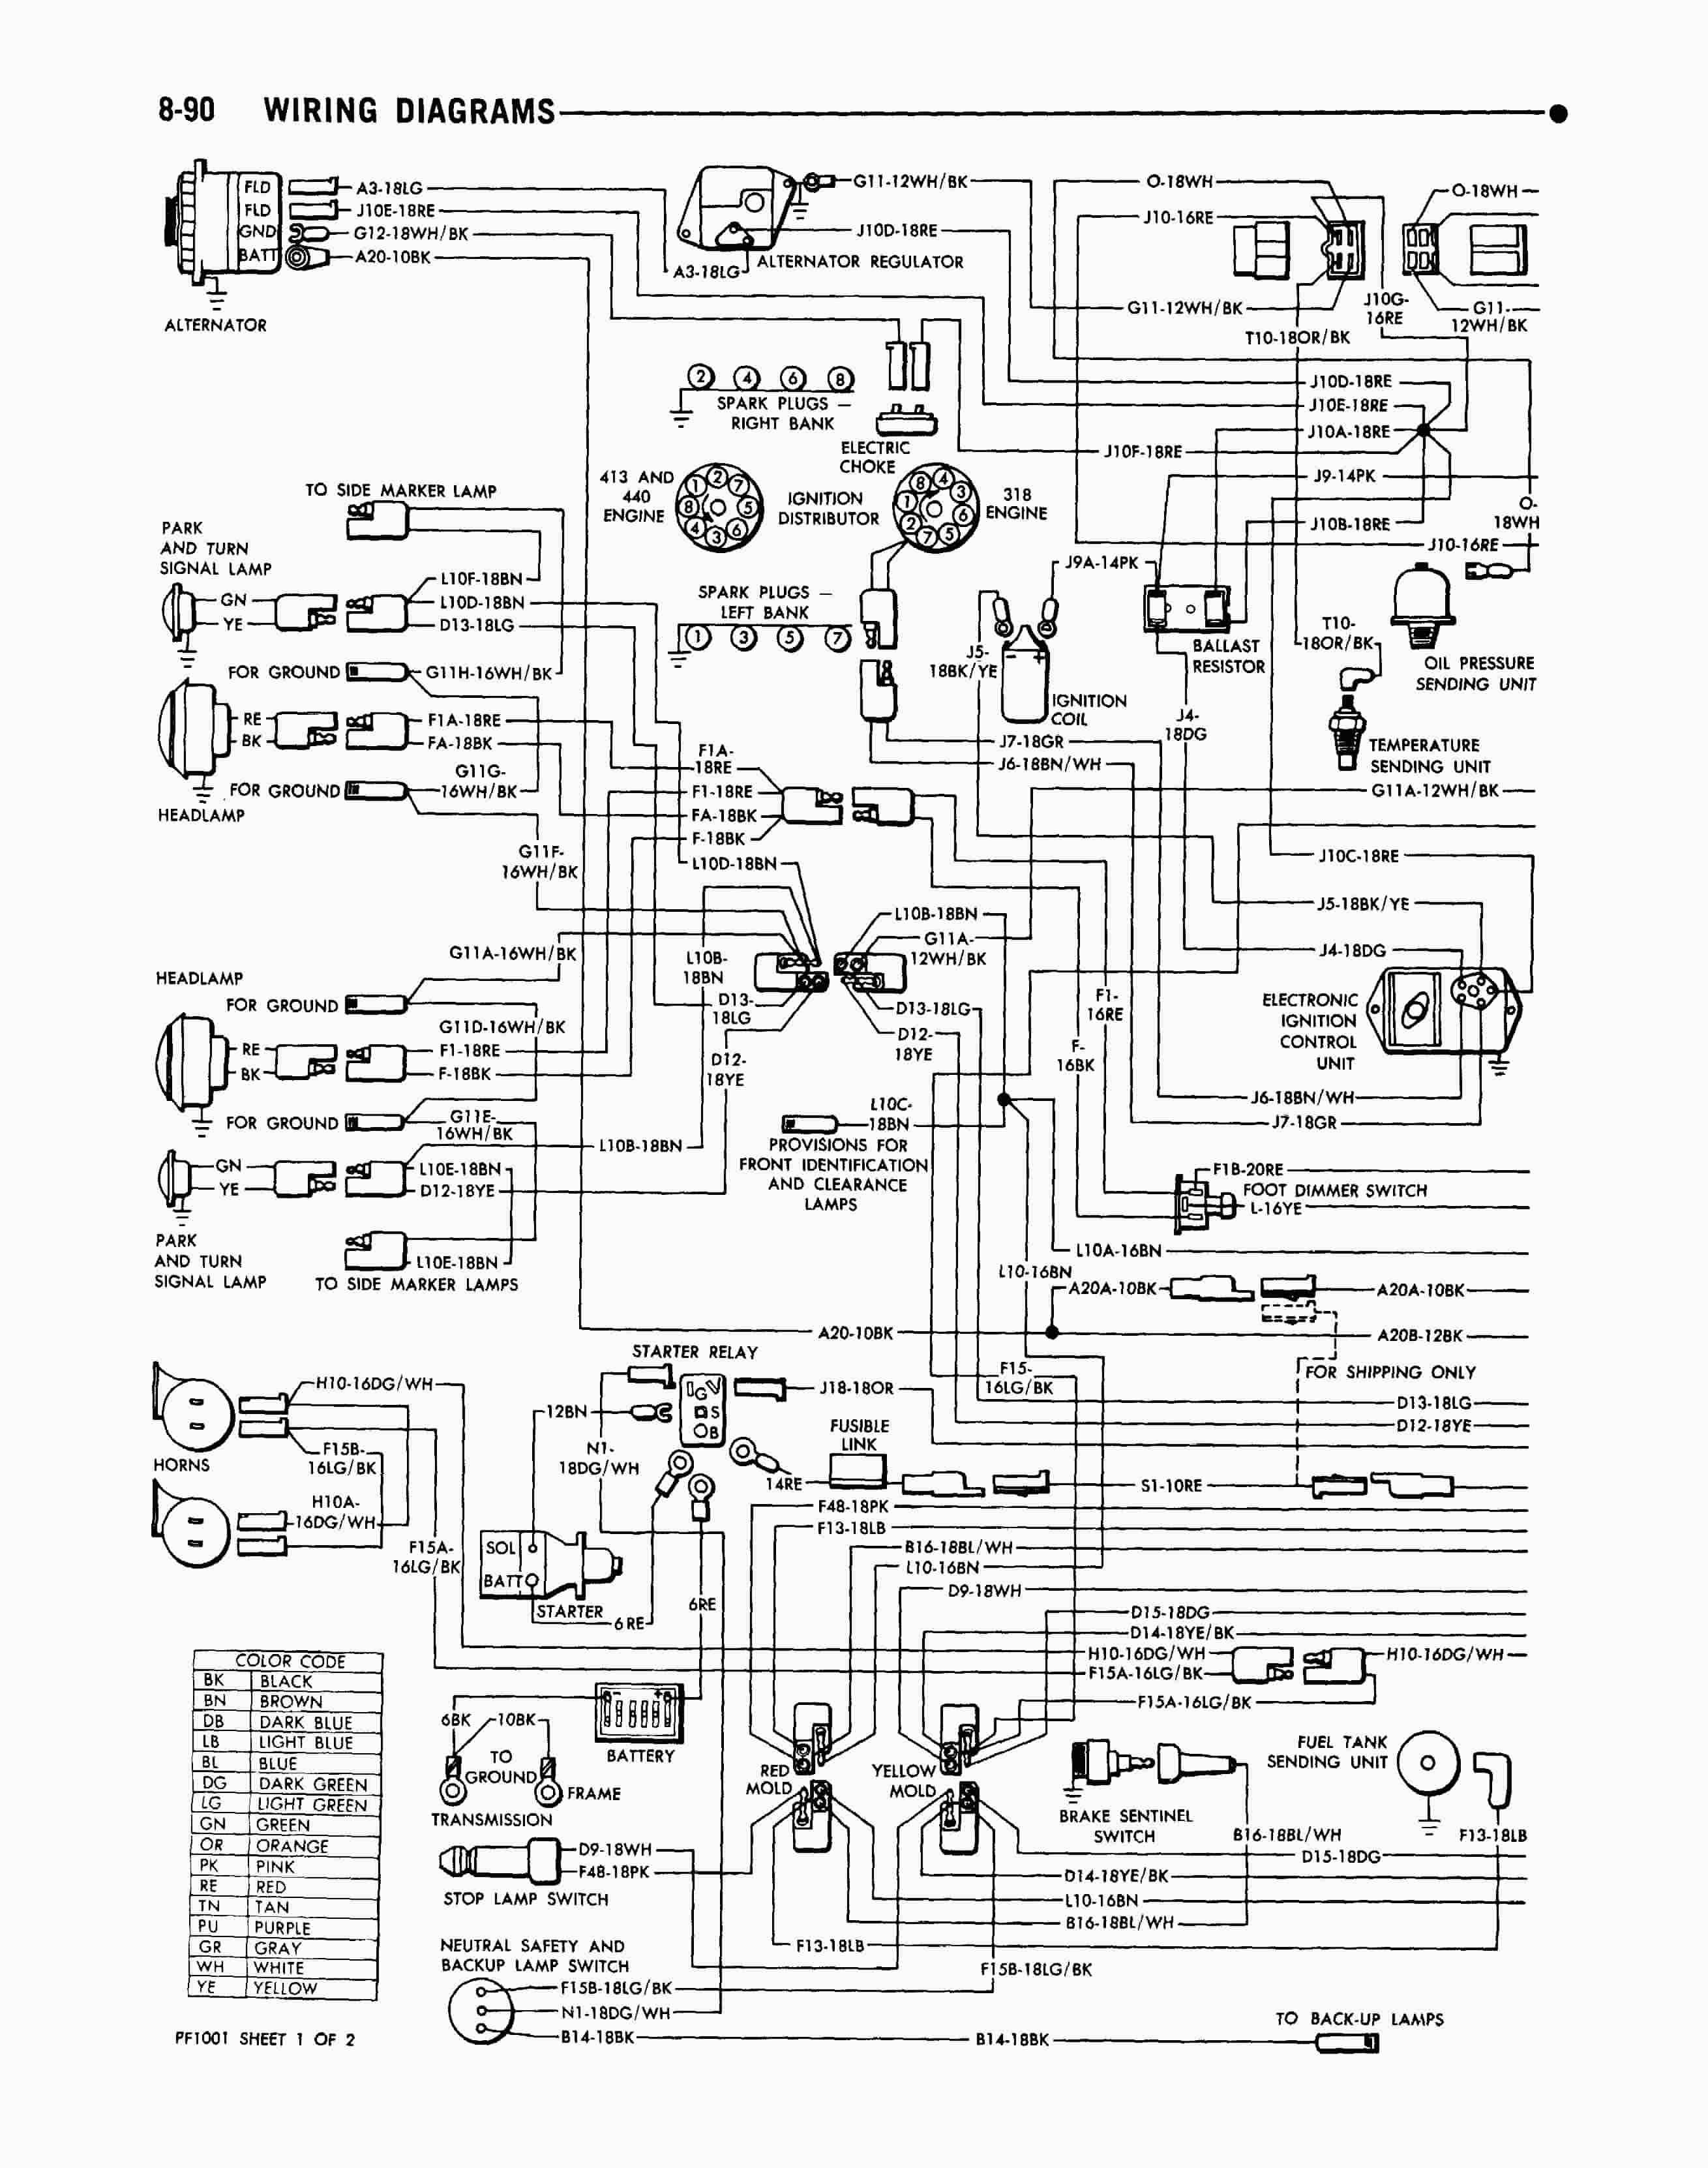 montana mountaineer wiring diagram - wiring diagrams data  ussel